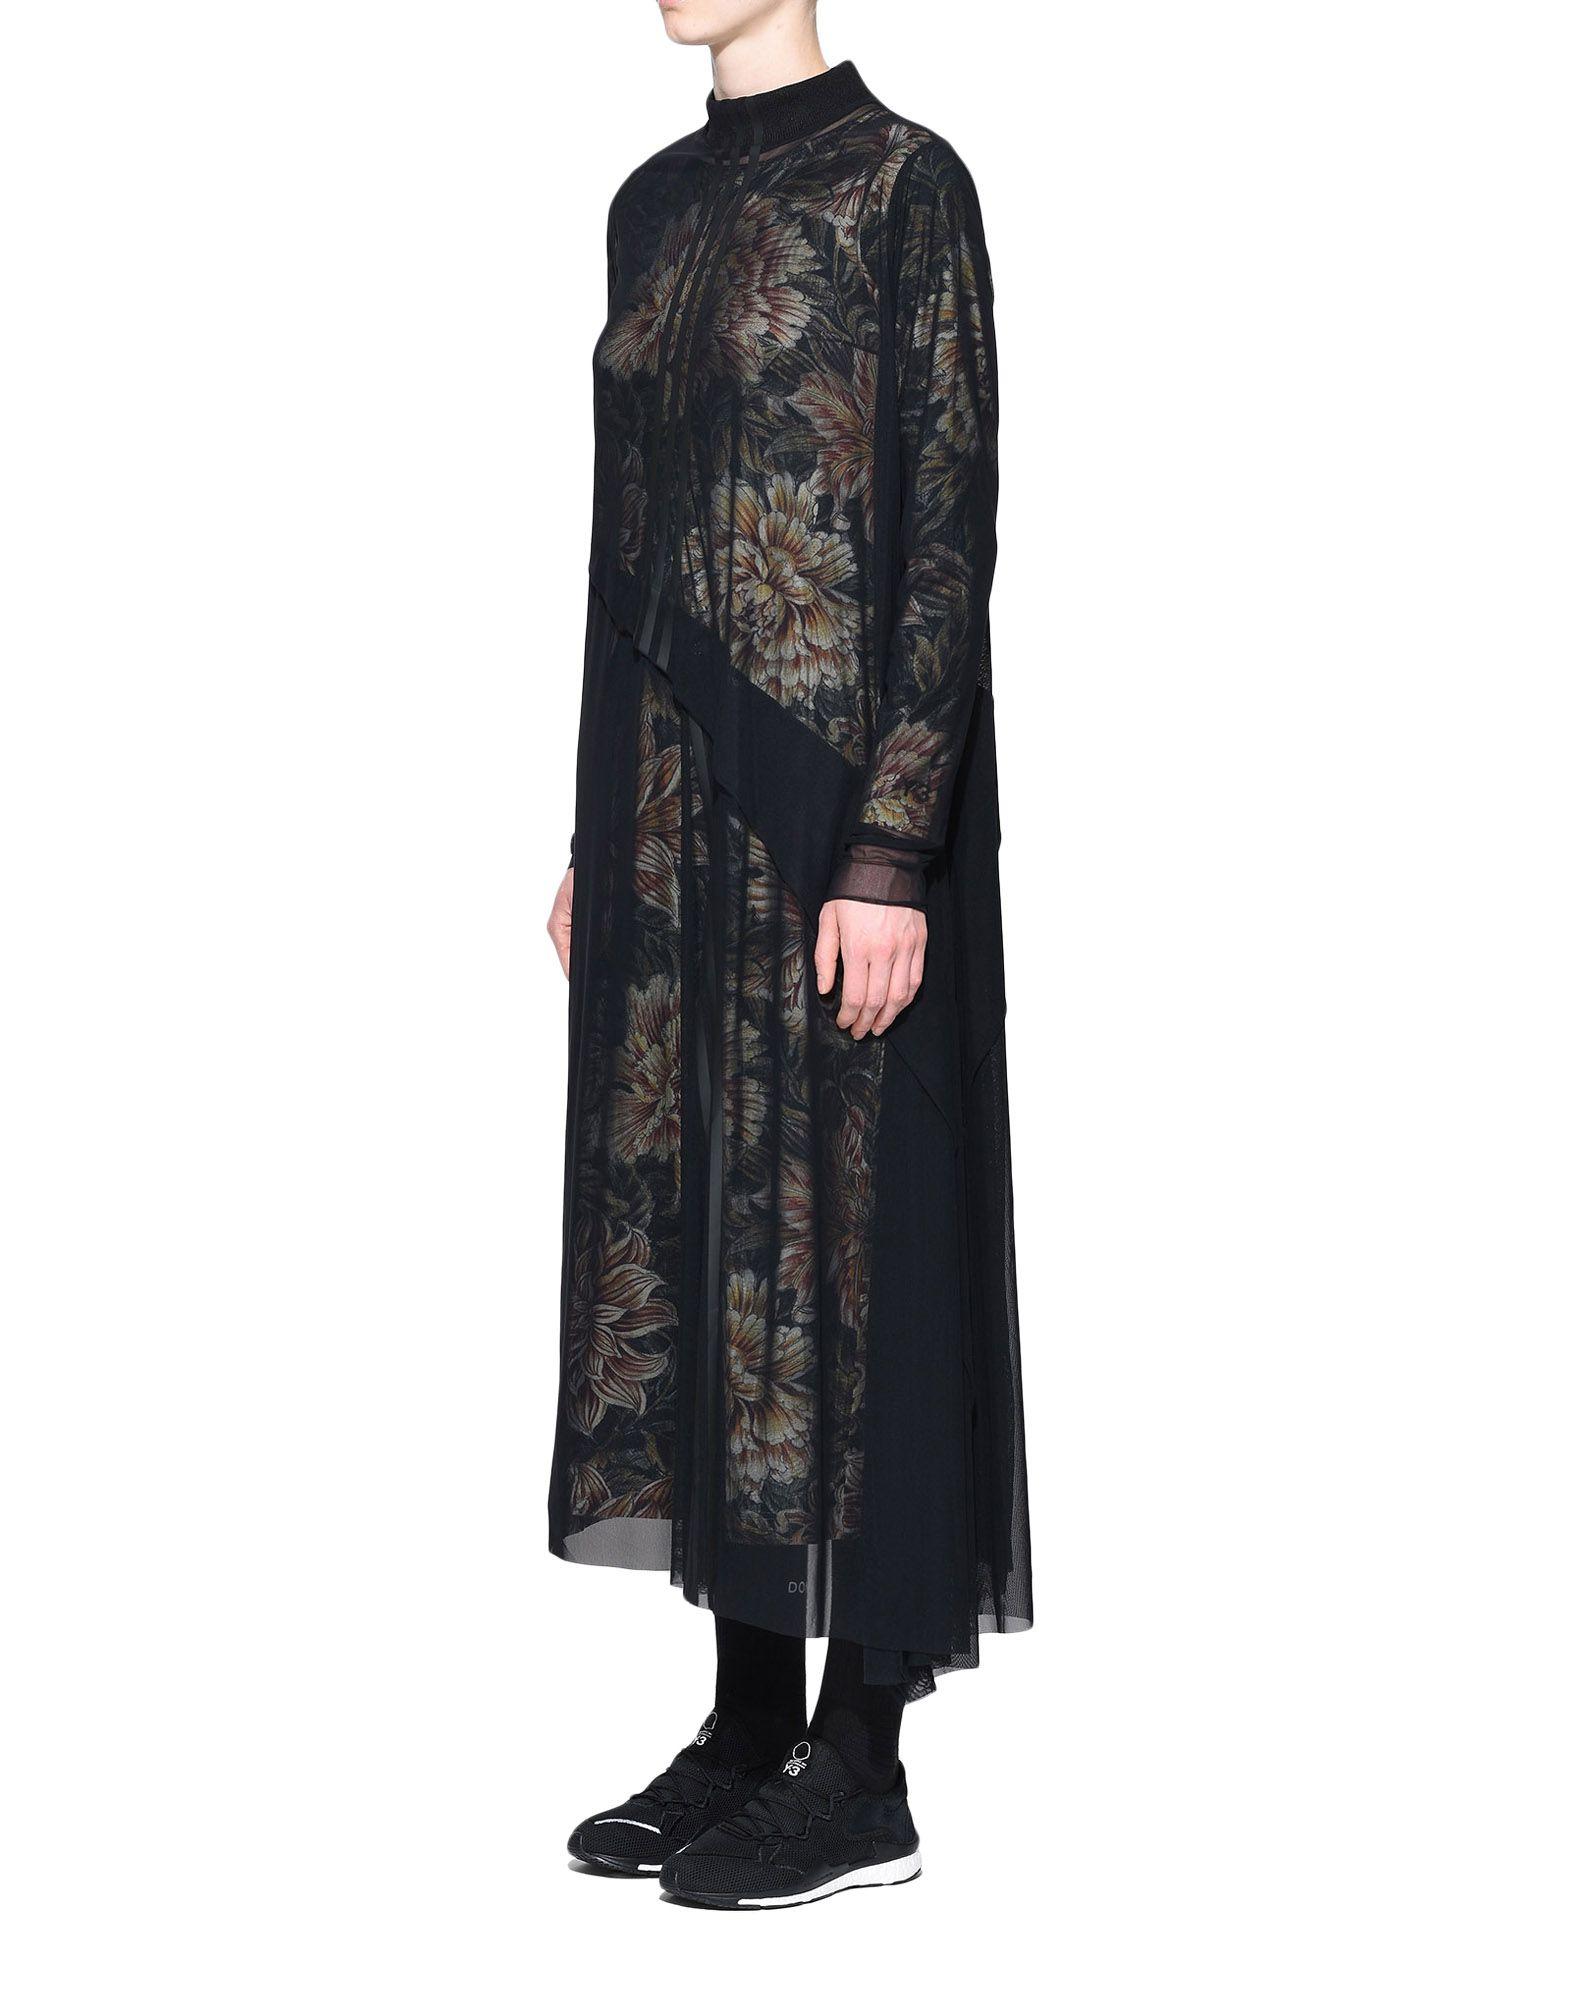 Y-3 Y-3 AOP 3-Stripes Mesh Dress Robe longue Femme d